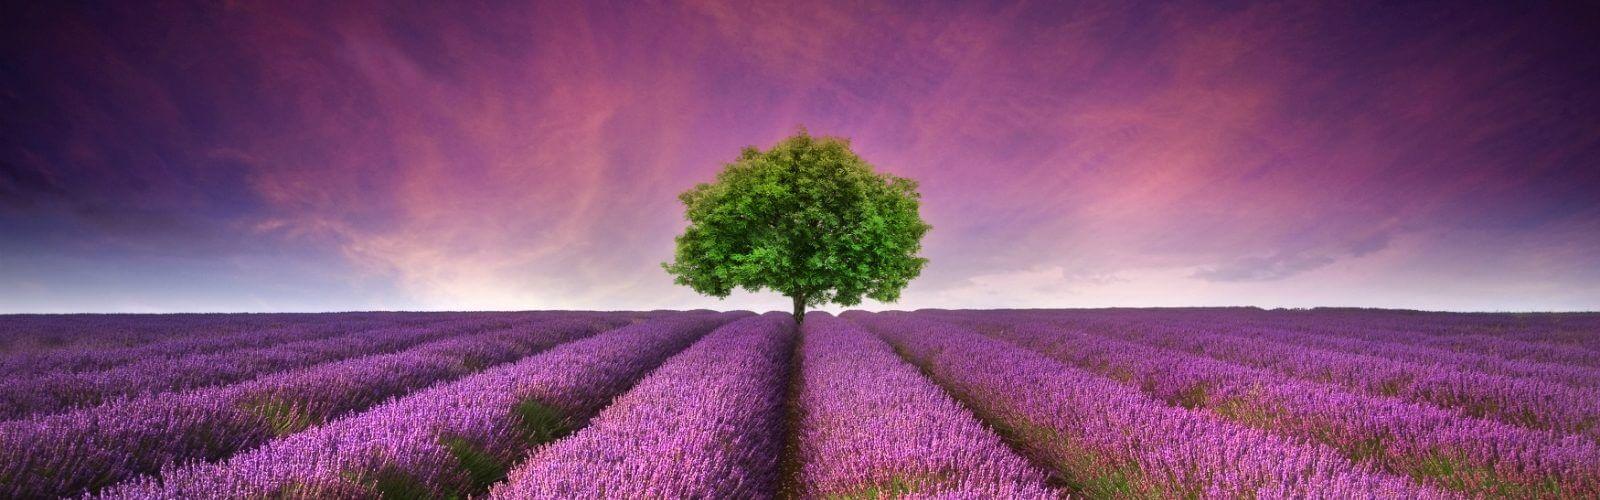 lavender-9-1600x500